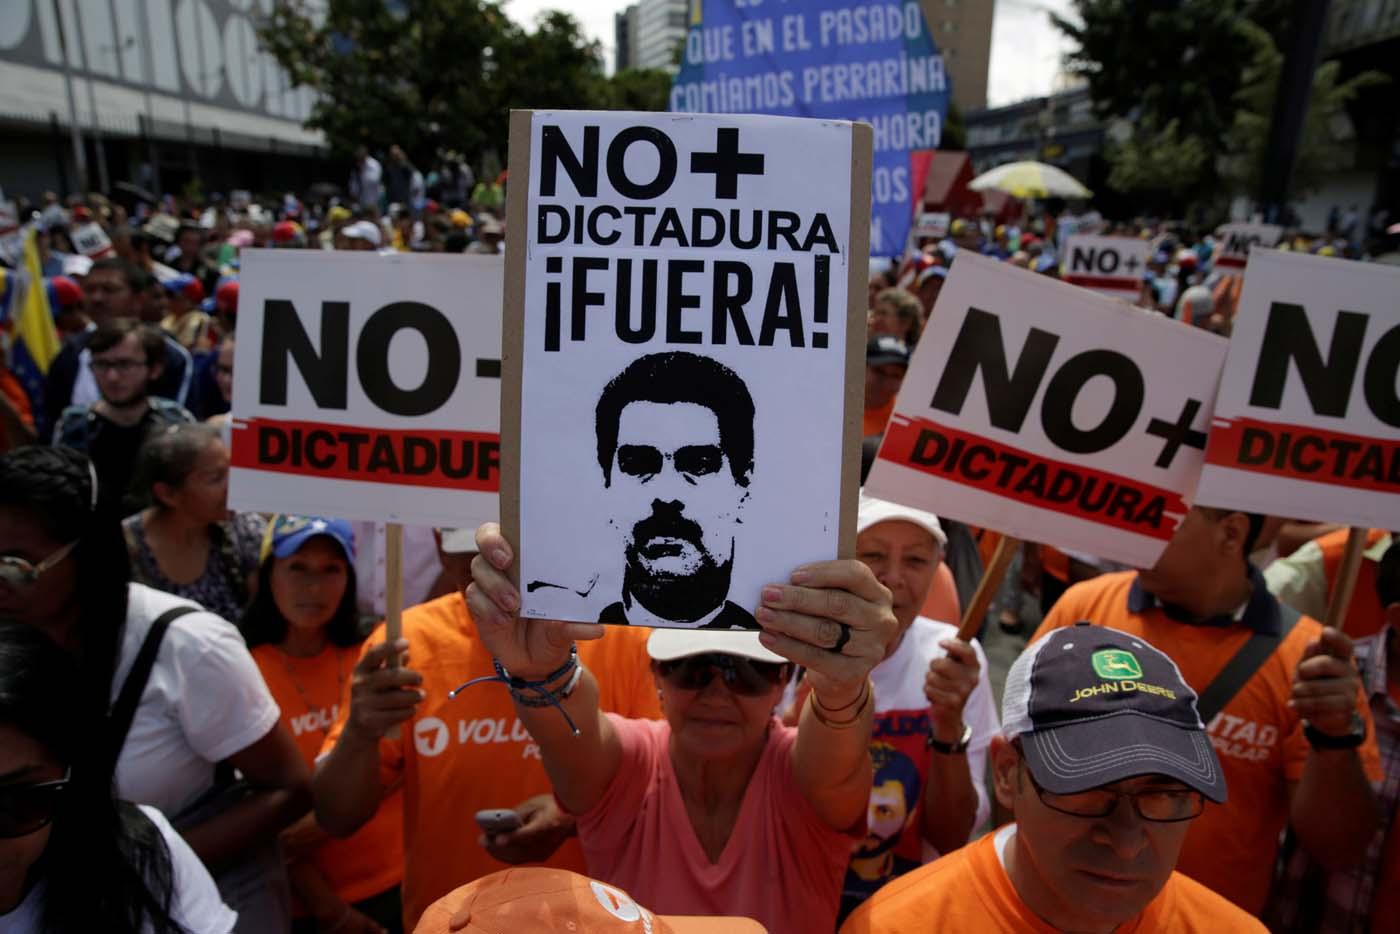 protesta marcha fuera dictadura - LaPatilla.com